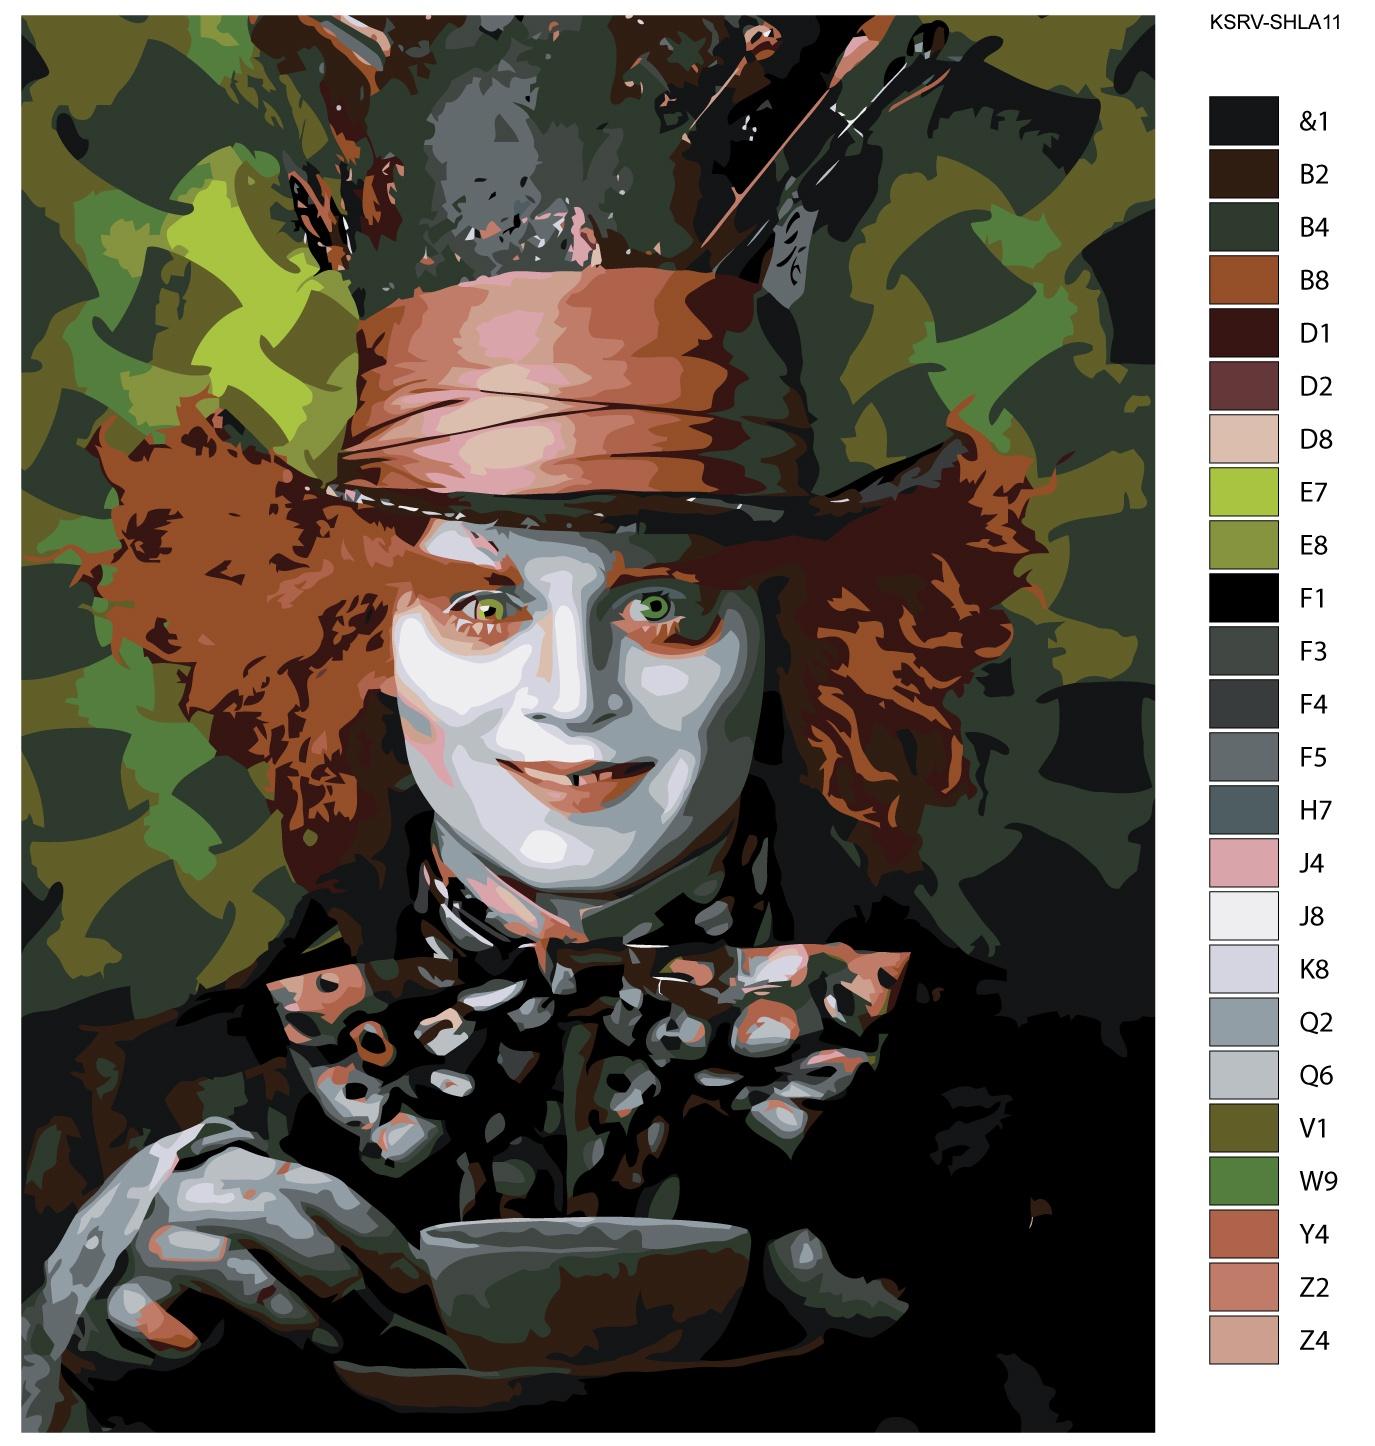 Картина по номерам, 80 x 100 см, KSRV-SHLA11 Живопись по номерам